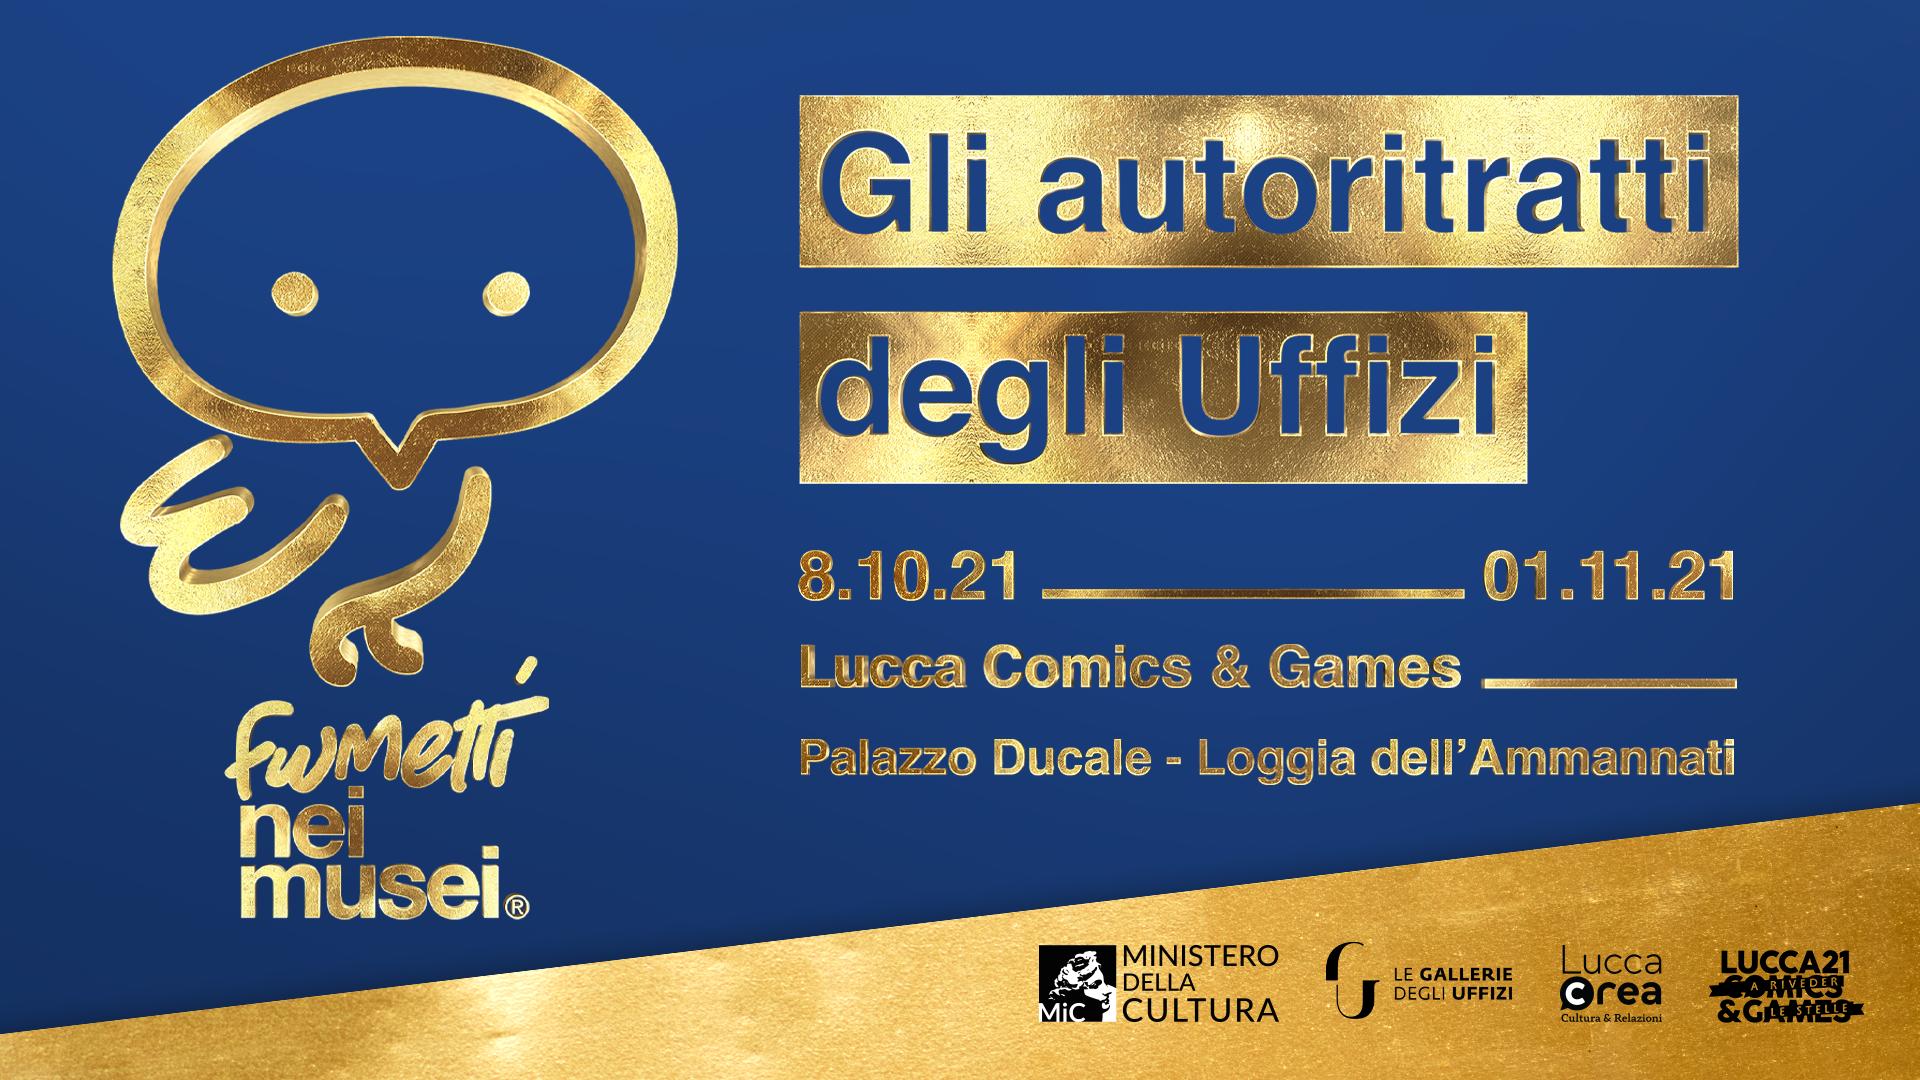 Fumetti_Autoritratti_Uffizi_Lucca